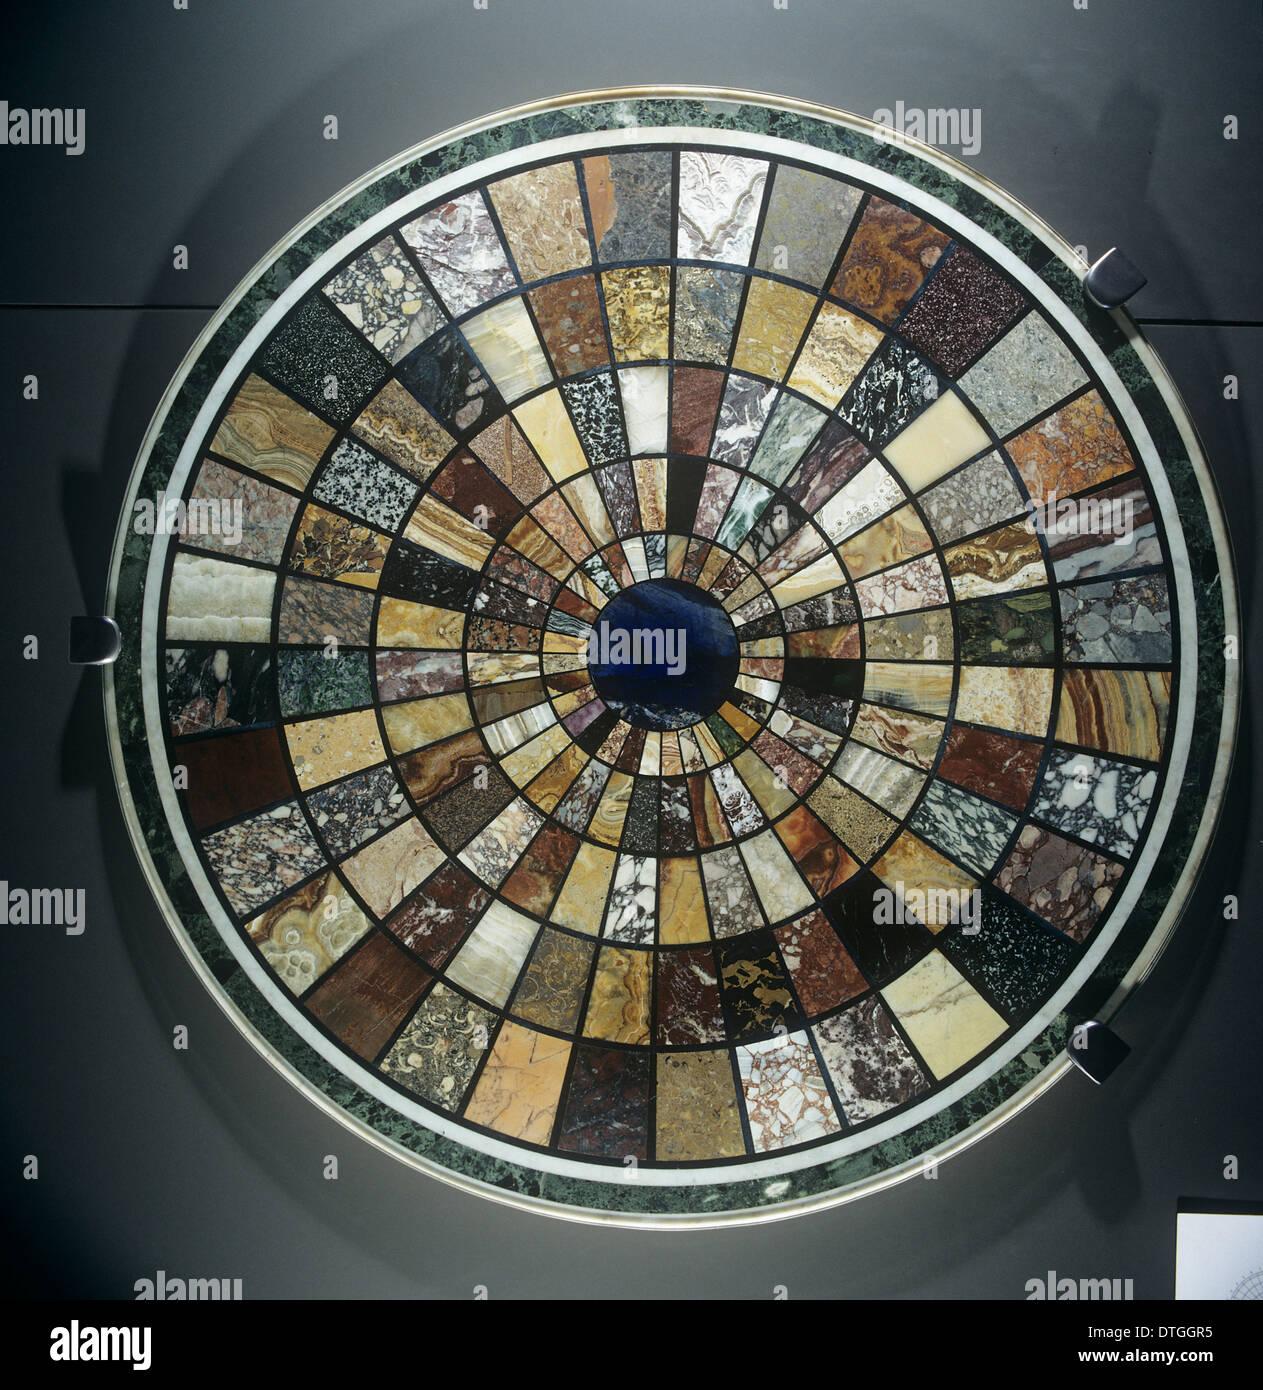 Tischplatte aus alten Roman Marbles Stockbild